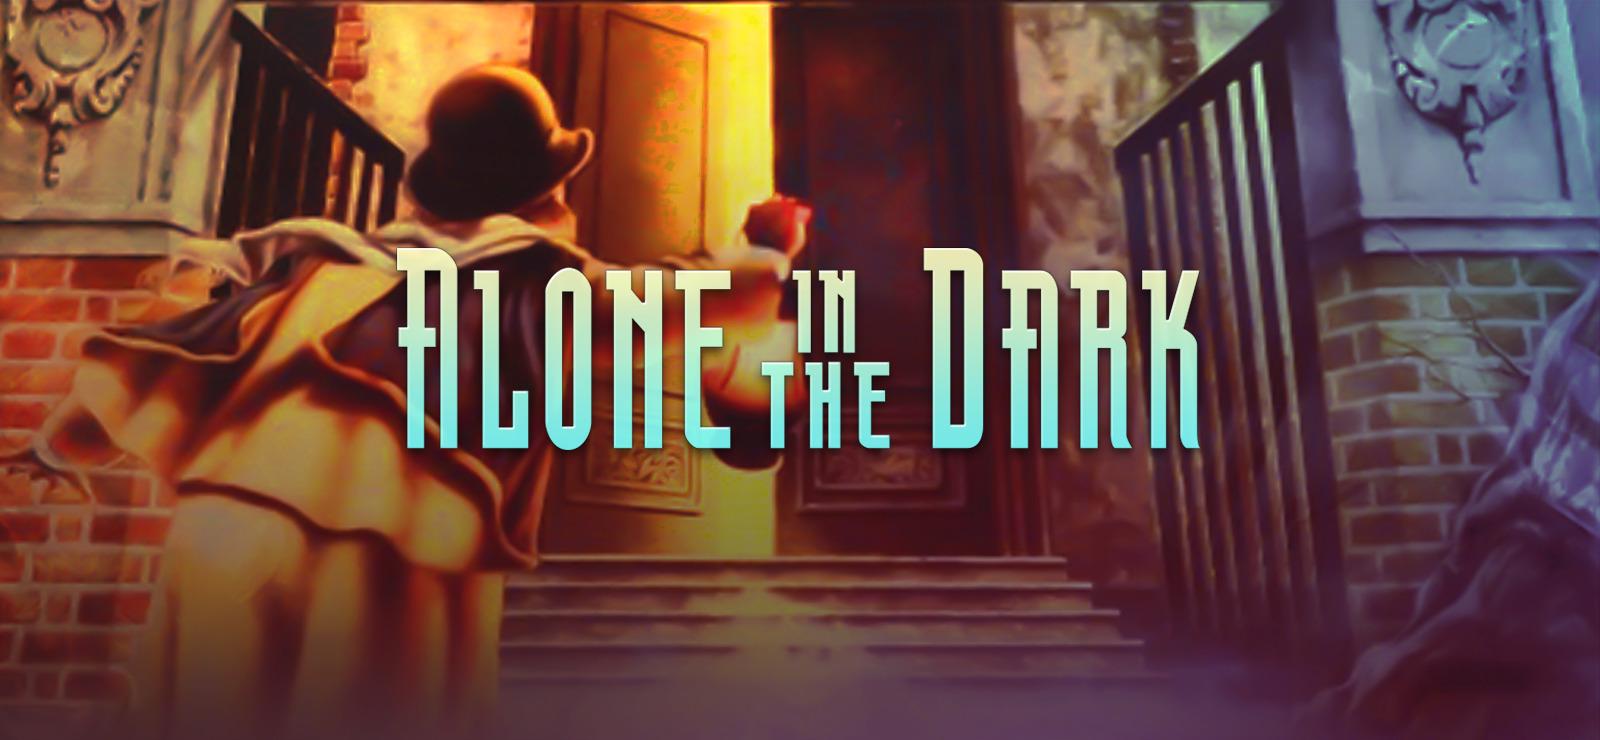 alone in the dark 3 walkthrough